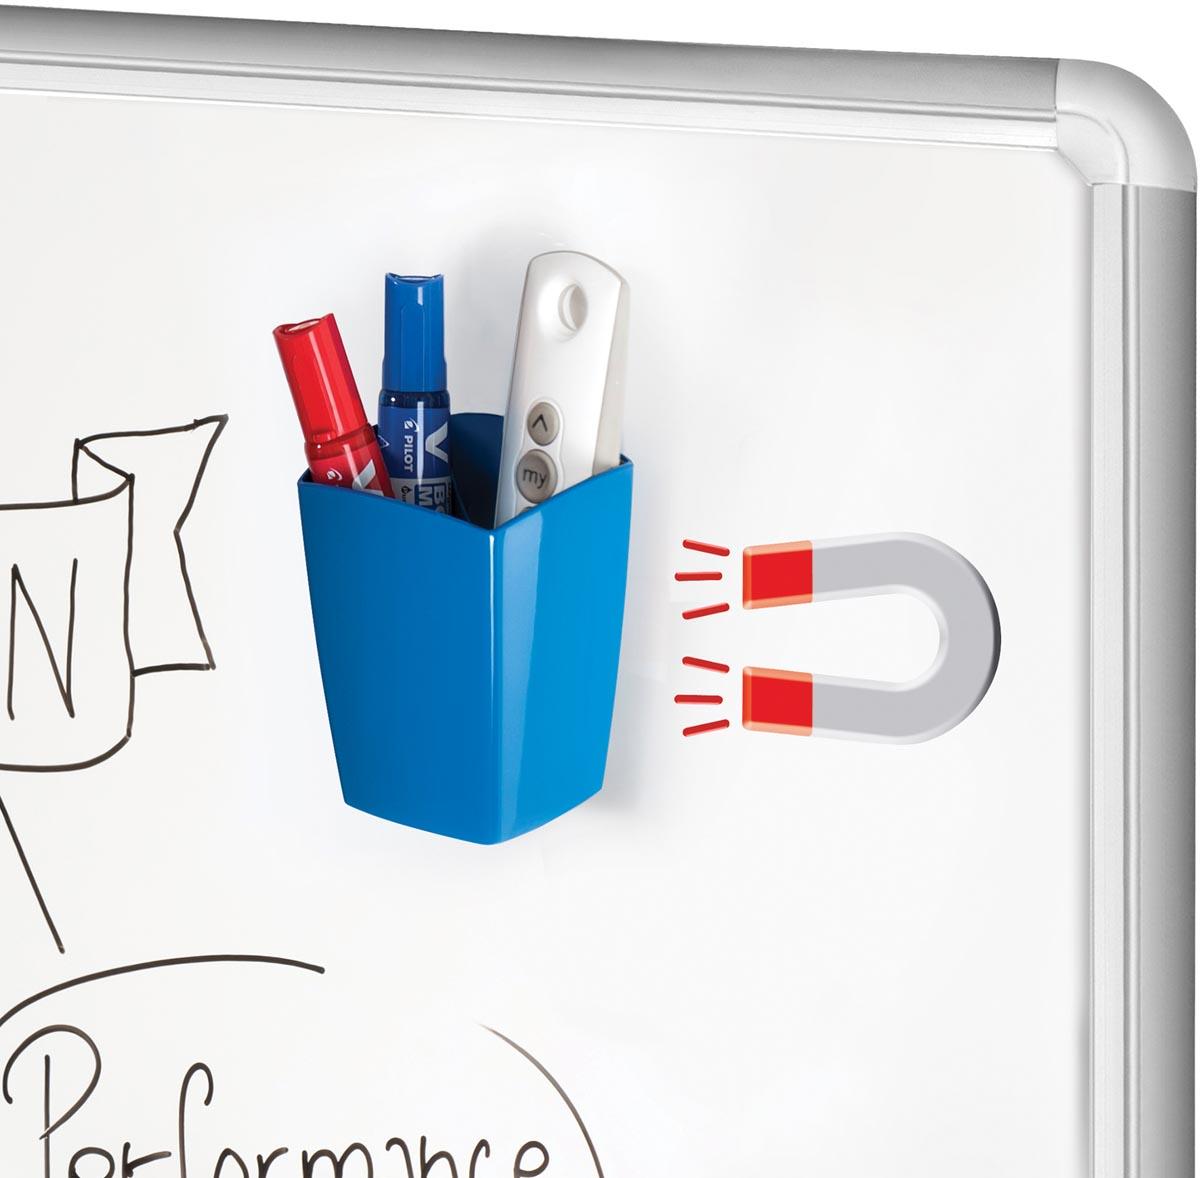 CEP magnetisch pennenbakje Gloss Blue Ocean, blauw